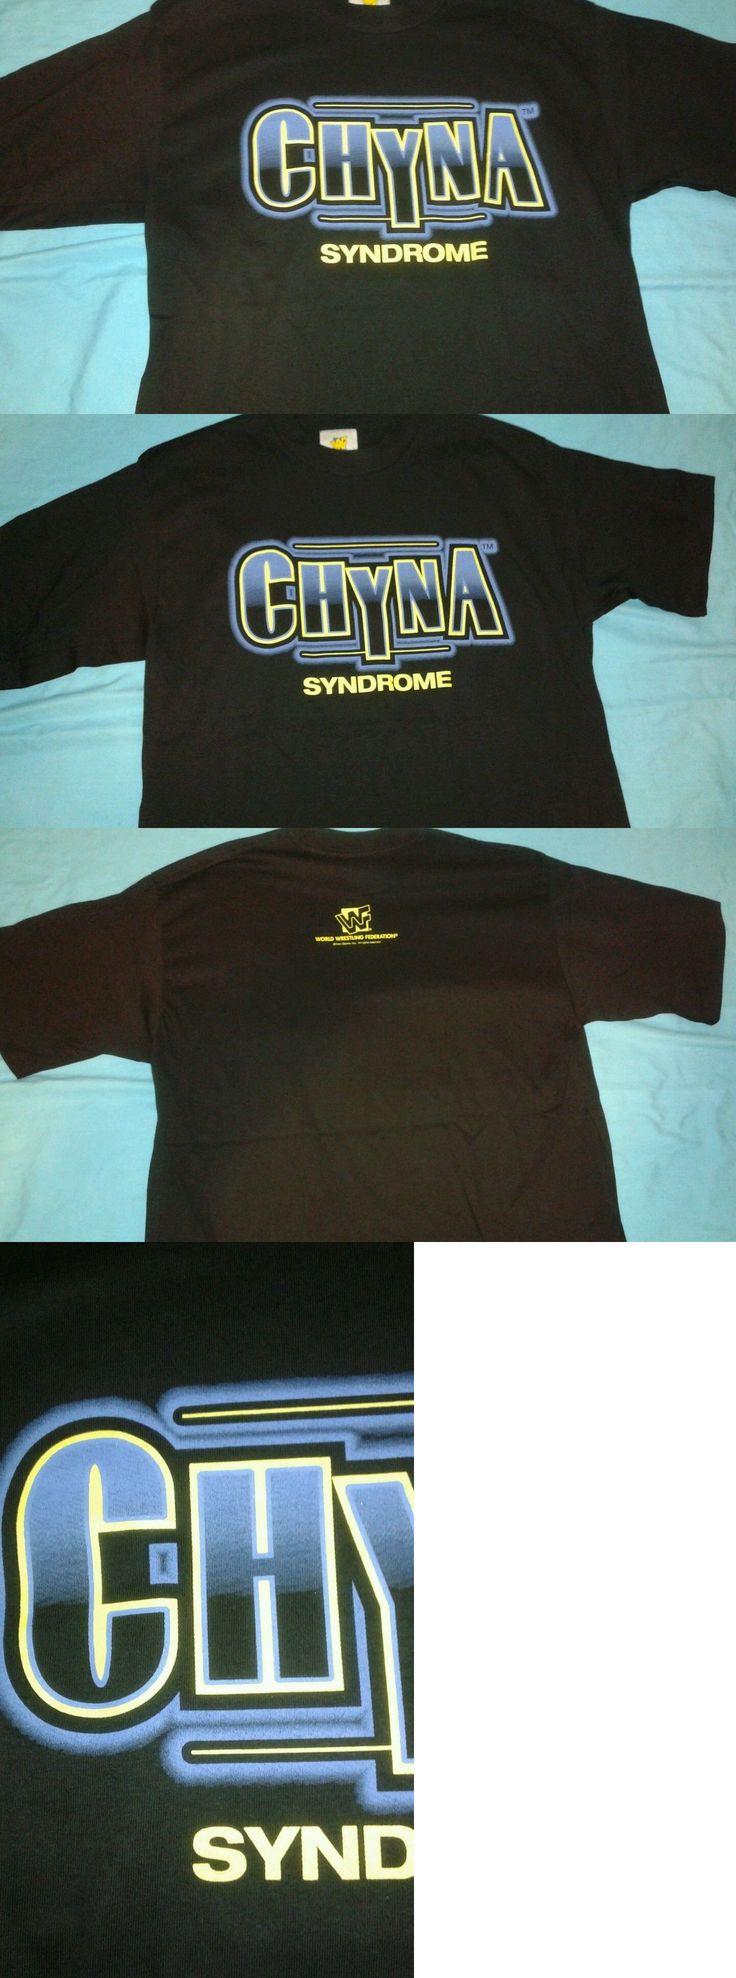 Wrestling 2902: Chyna Syndrome Wwf 1997 T-Shirt Size Large New Unworn Wwe Tna Wcw Njpw Wrestling -> BUY IT NOW ONLY: $35 on eBay!